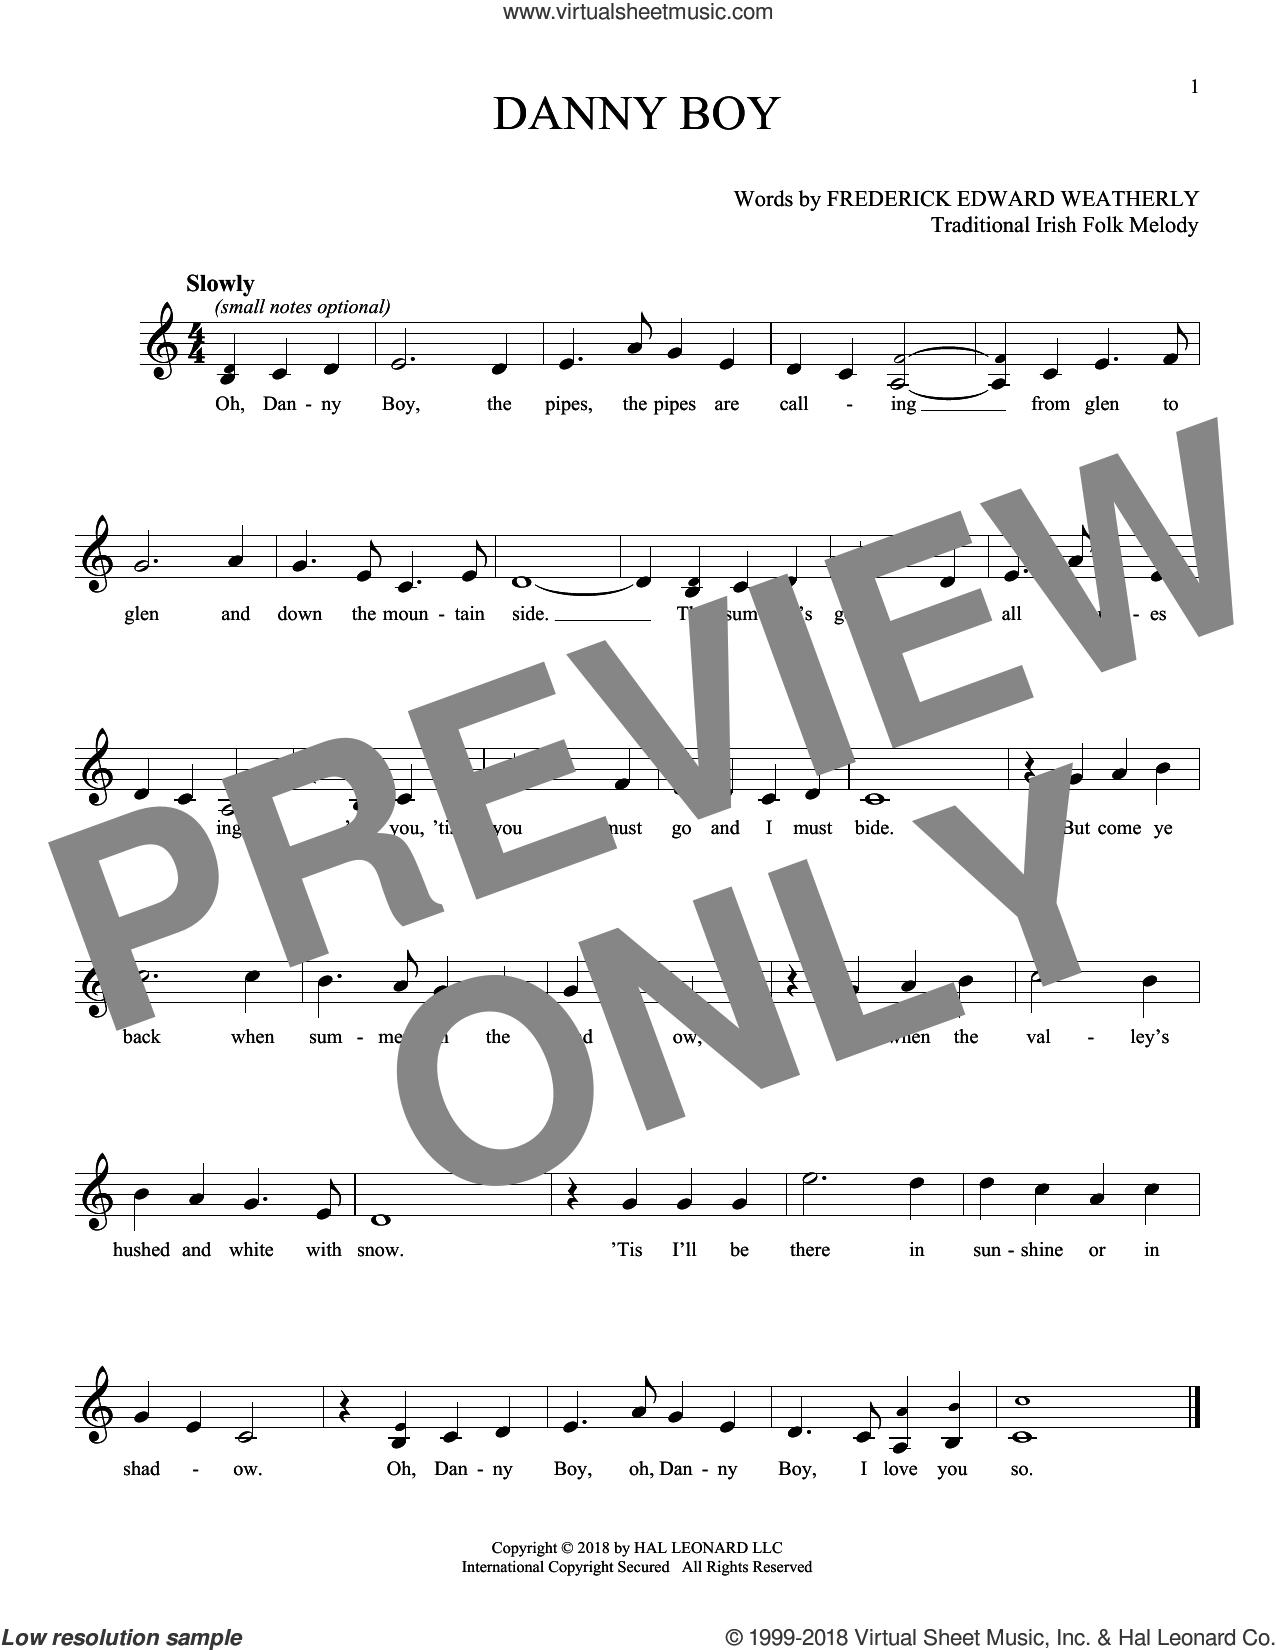 Danny Boy sheet music for ocarina solo by Traditional Irish and Frederick Edward Weatherly, intermediate skill level